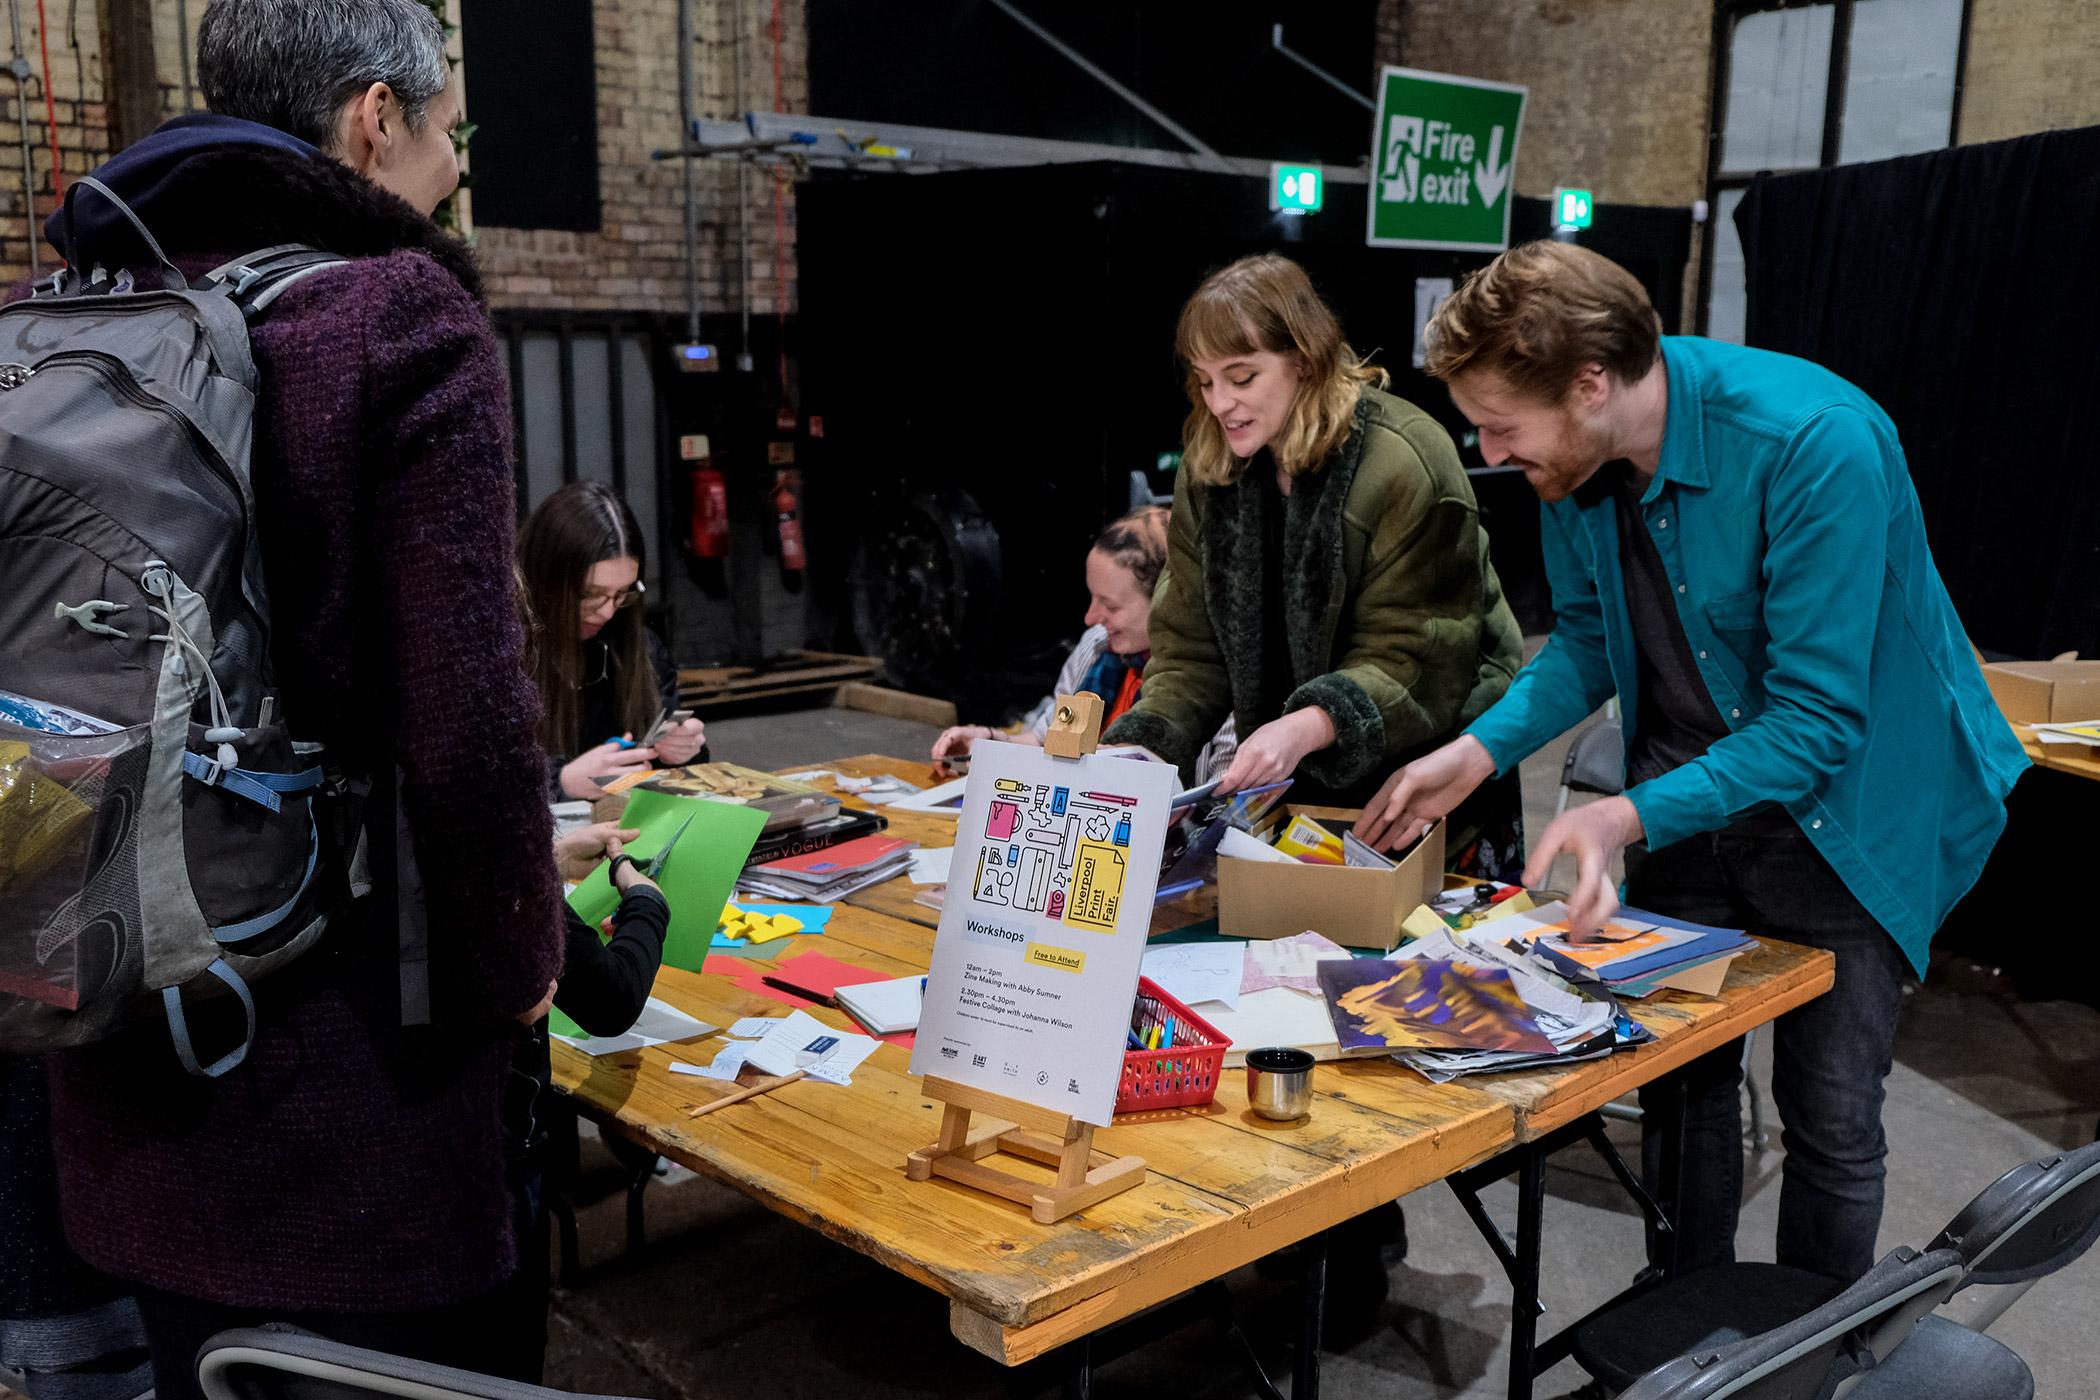 Collage Workshop with Johanna Wilson at Liverpool Print Fair, Nov 2019